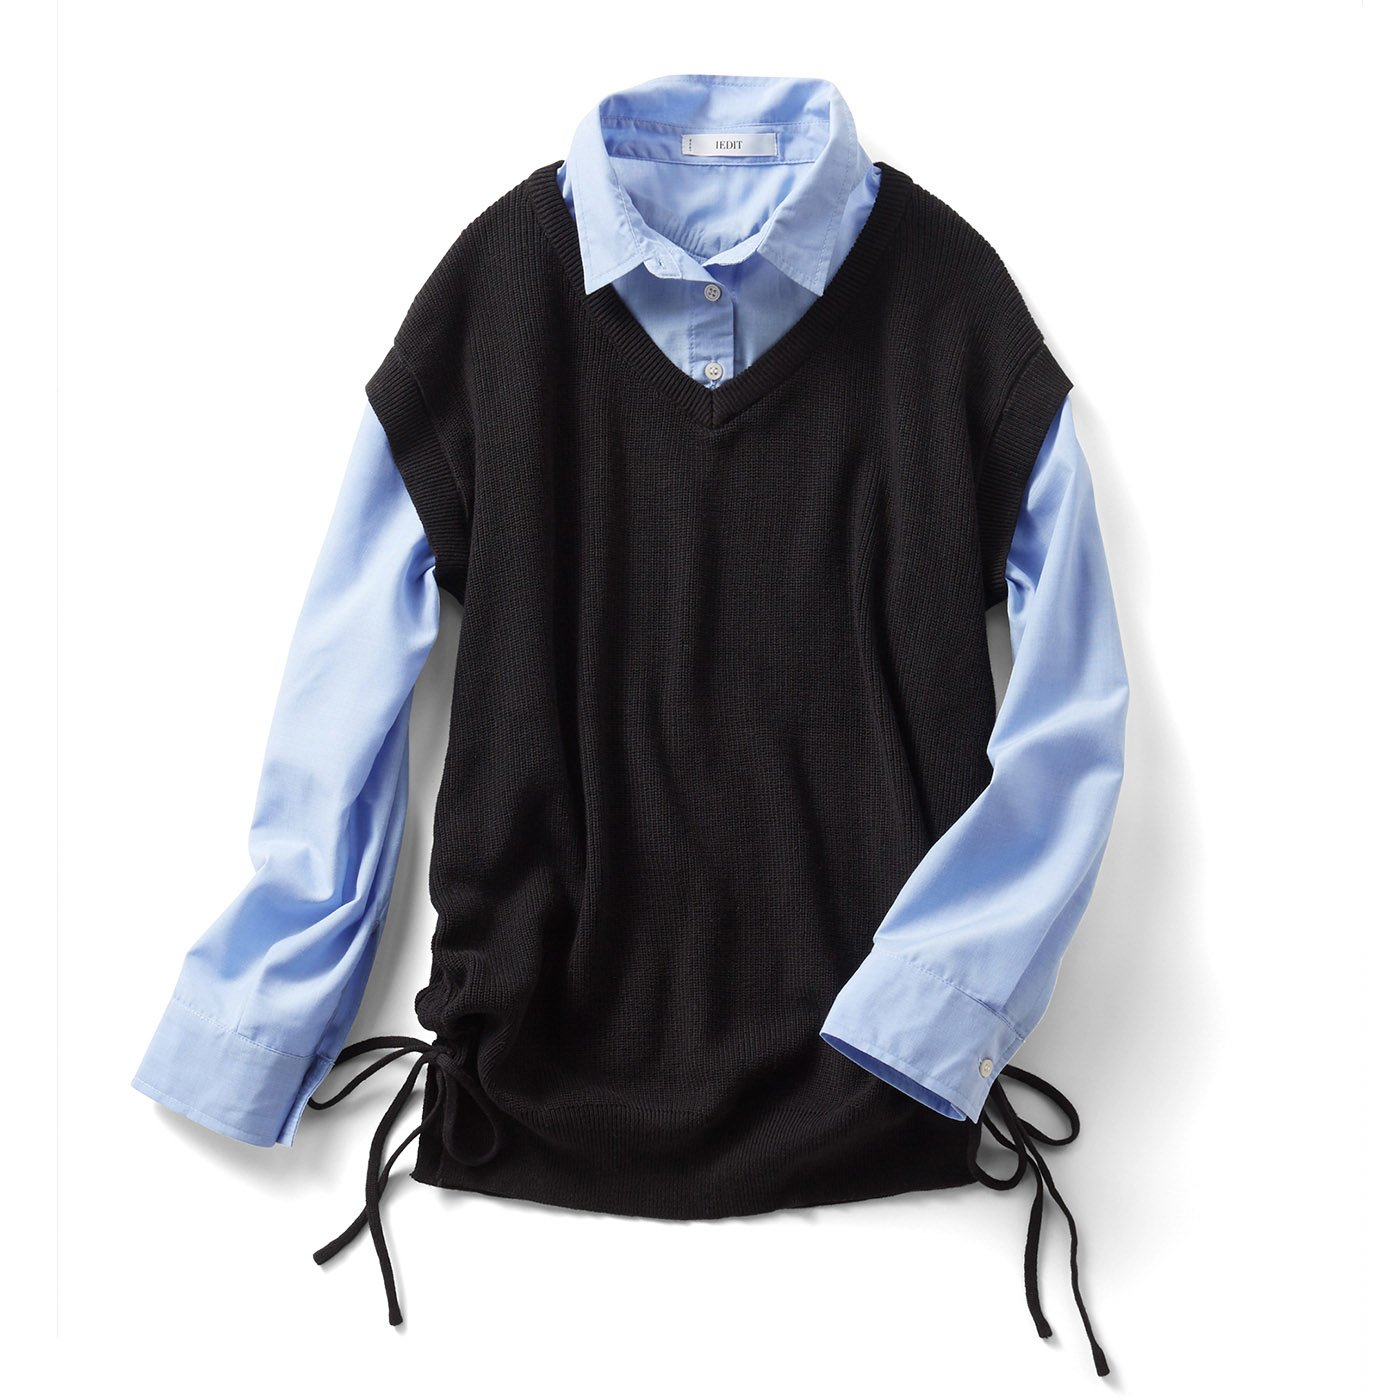 IEDIT 一枚で時短コーデ! ニットベストとシャツのレイヤード風プルオーバー〈ブラック〉